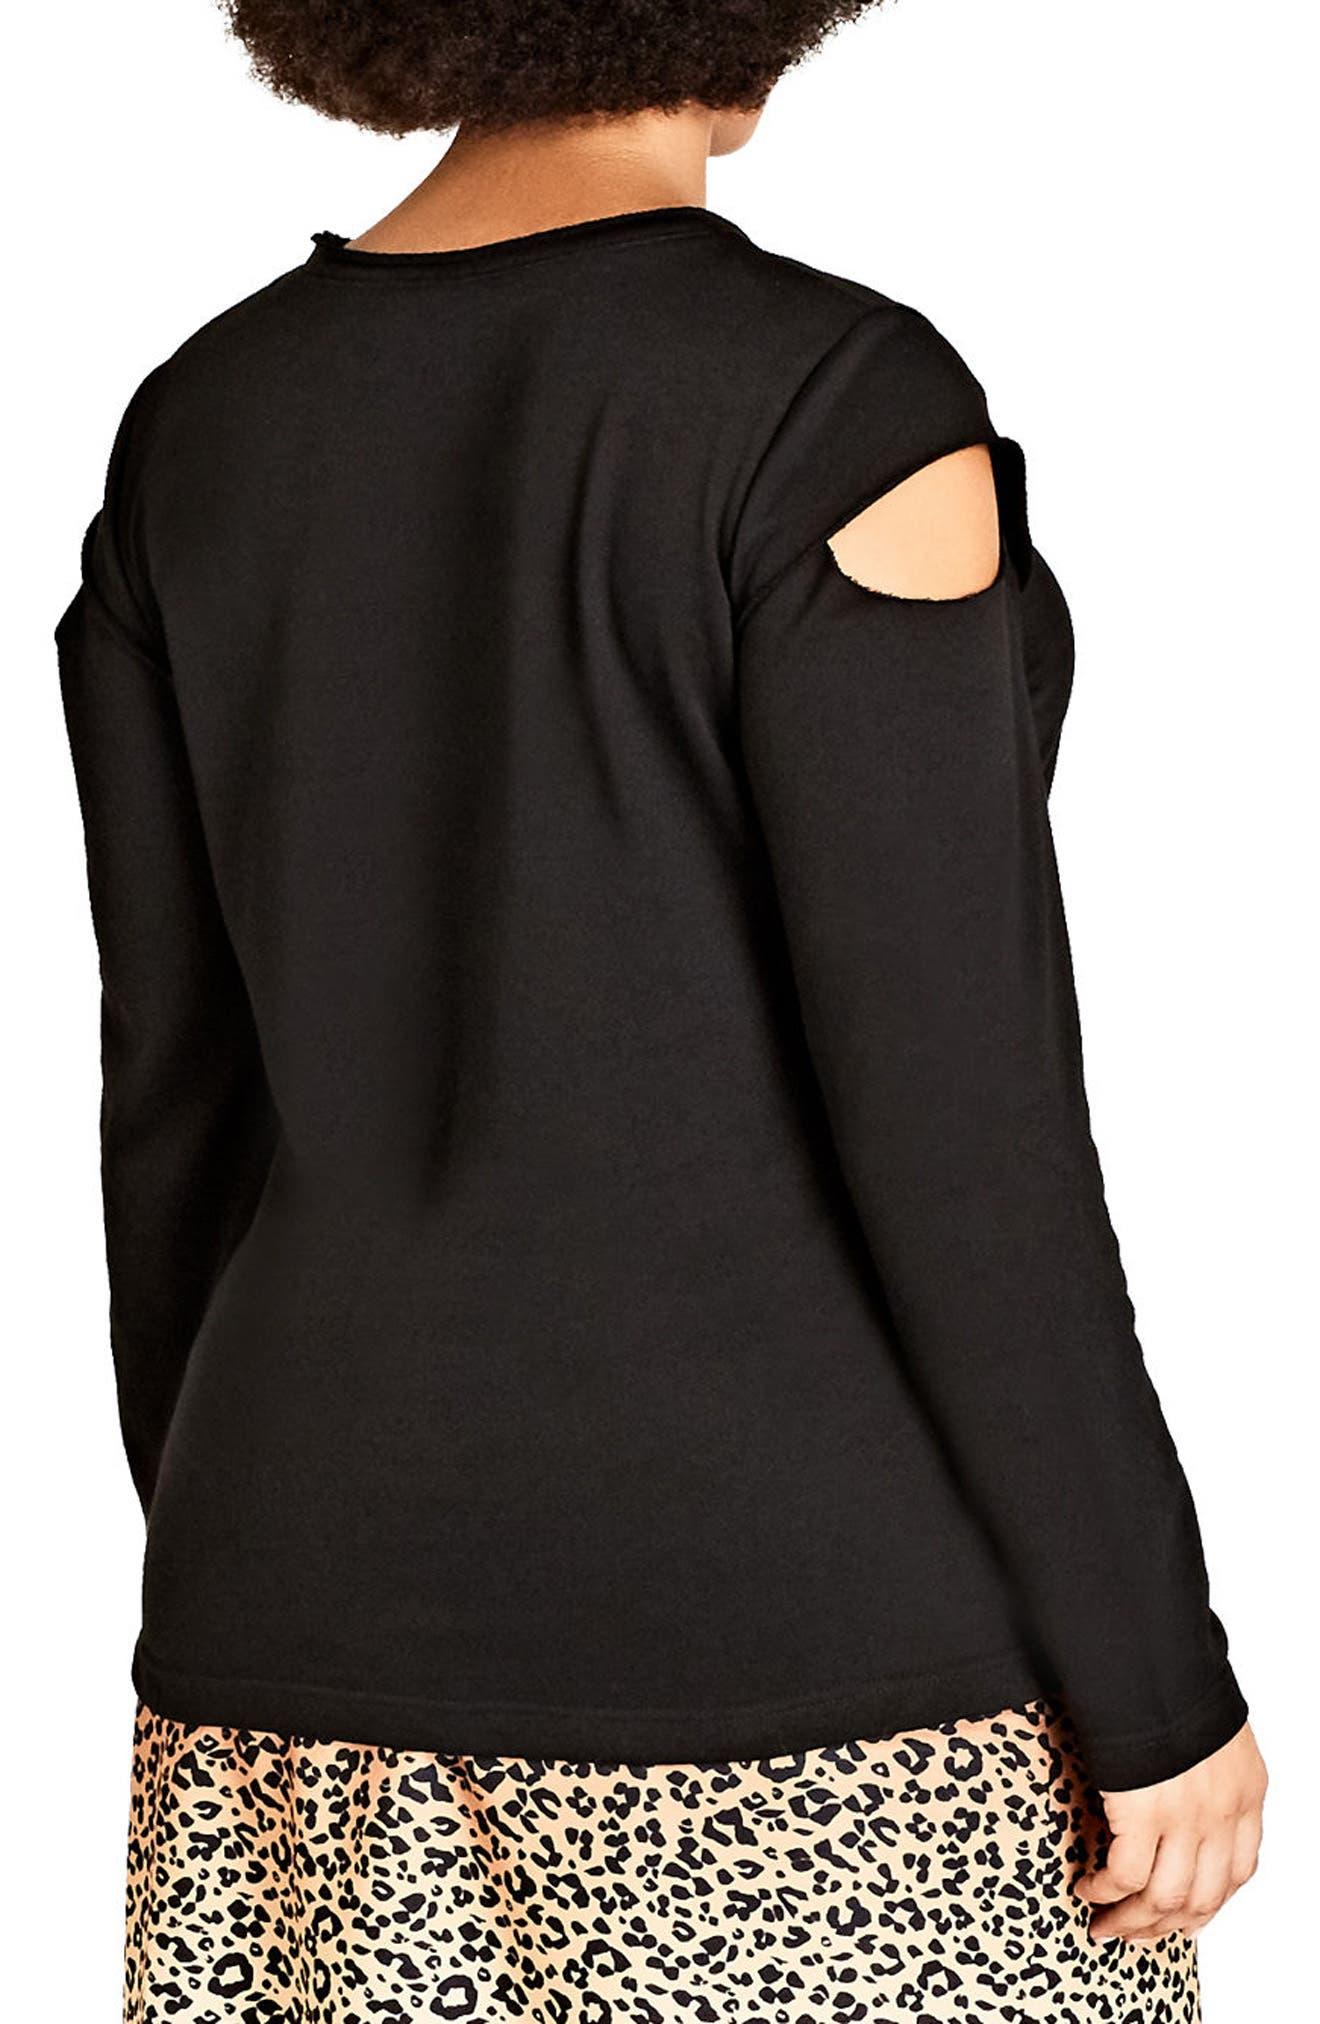 Street Vibe Sweatshirt,                             Alternate thumbnail 2, color,                             Black